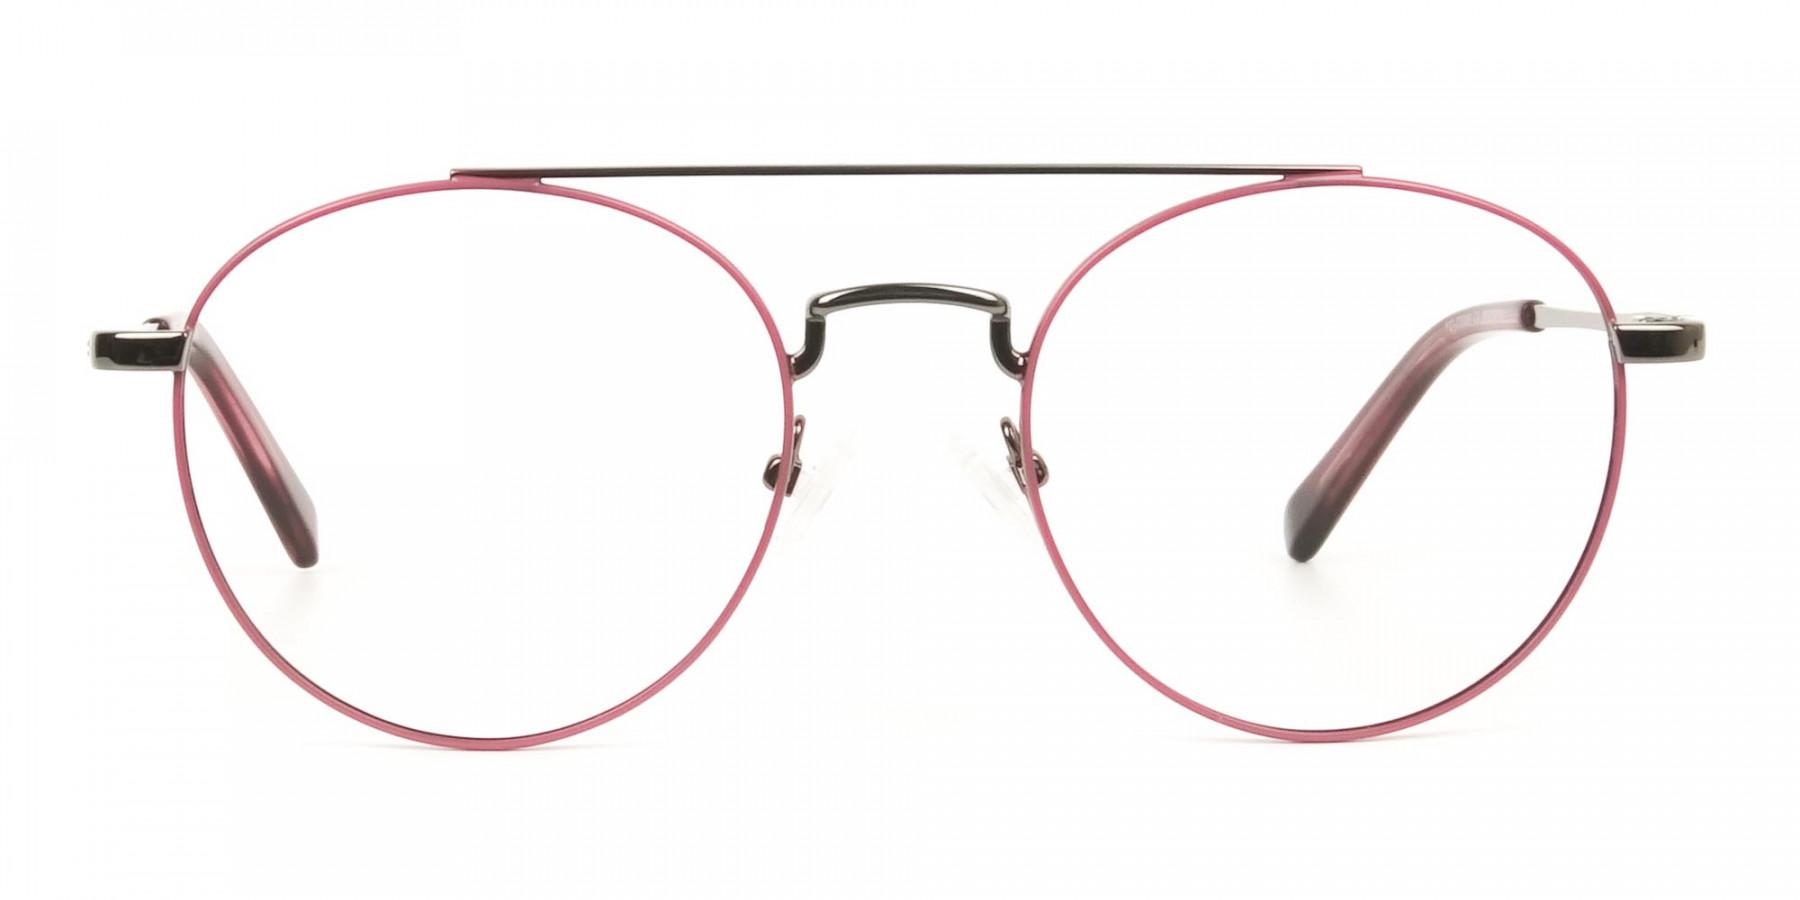 Lightweight Gunmetal & Red Round Aviator Glasses in Metal - 1